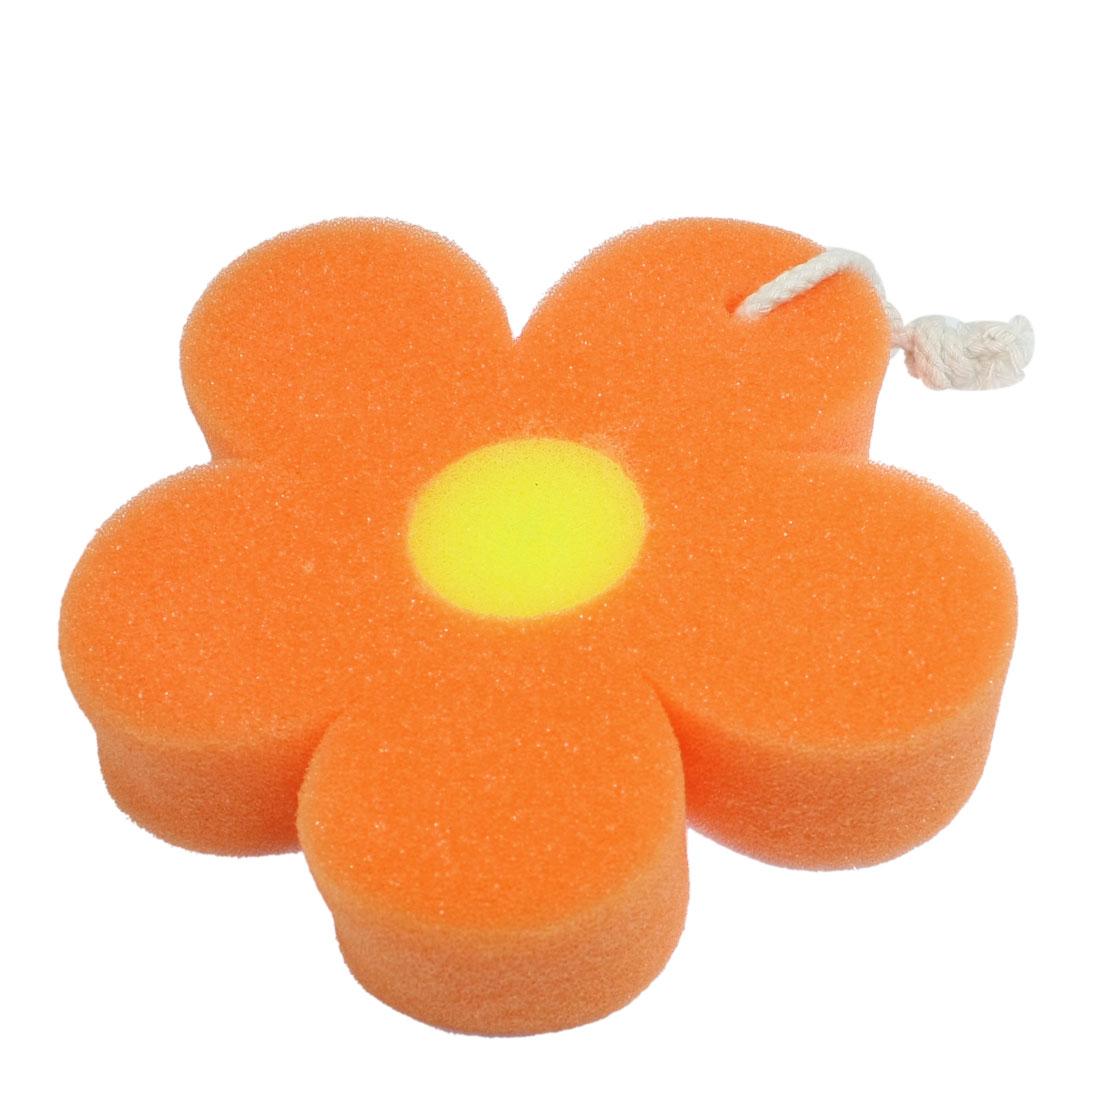 Bathroom Orange Flower Shaped Sponge Bath Scrubber Shower Puff